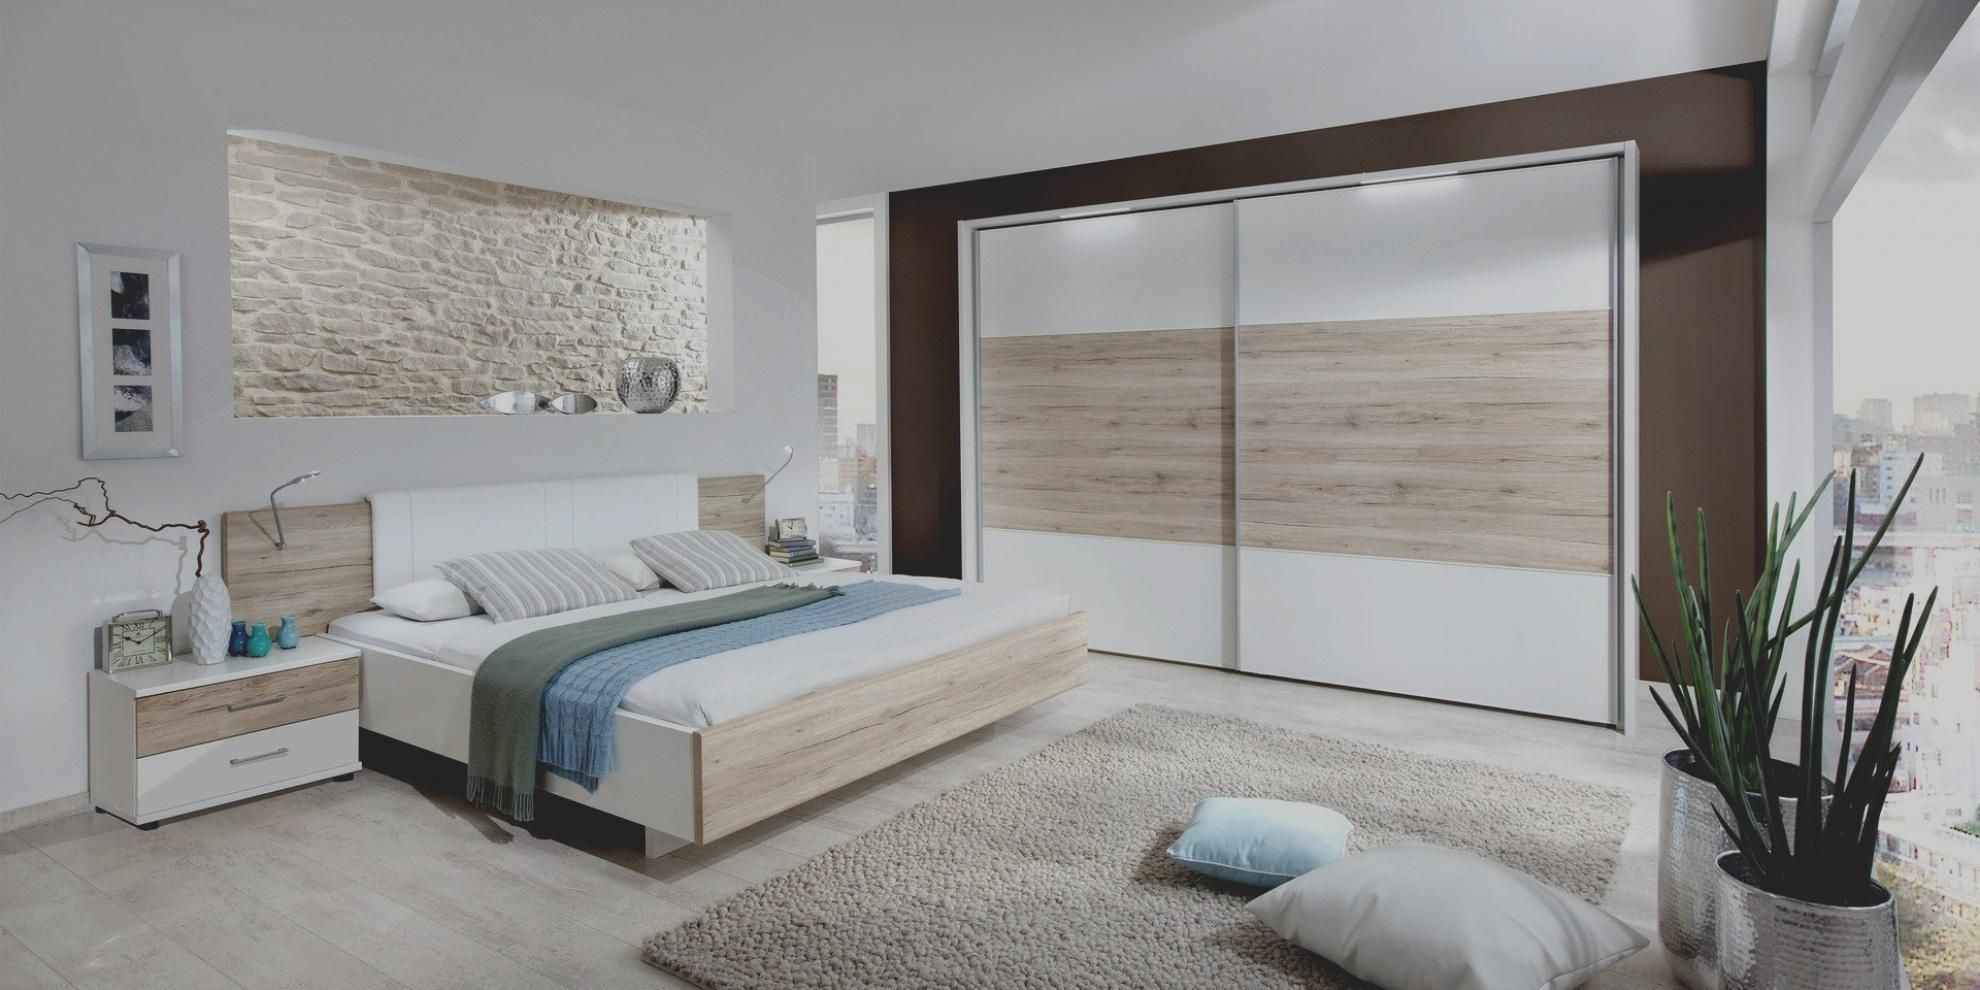 51 Schlafzimmer Ideen Wandgestaltung Braun Modern Bedroom Furniture Sets Contemporary Bedroom Furniture Sets Modern Bedroom Furniture Bedroom set with wardrobe